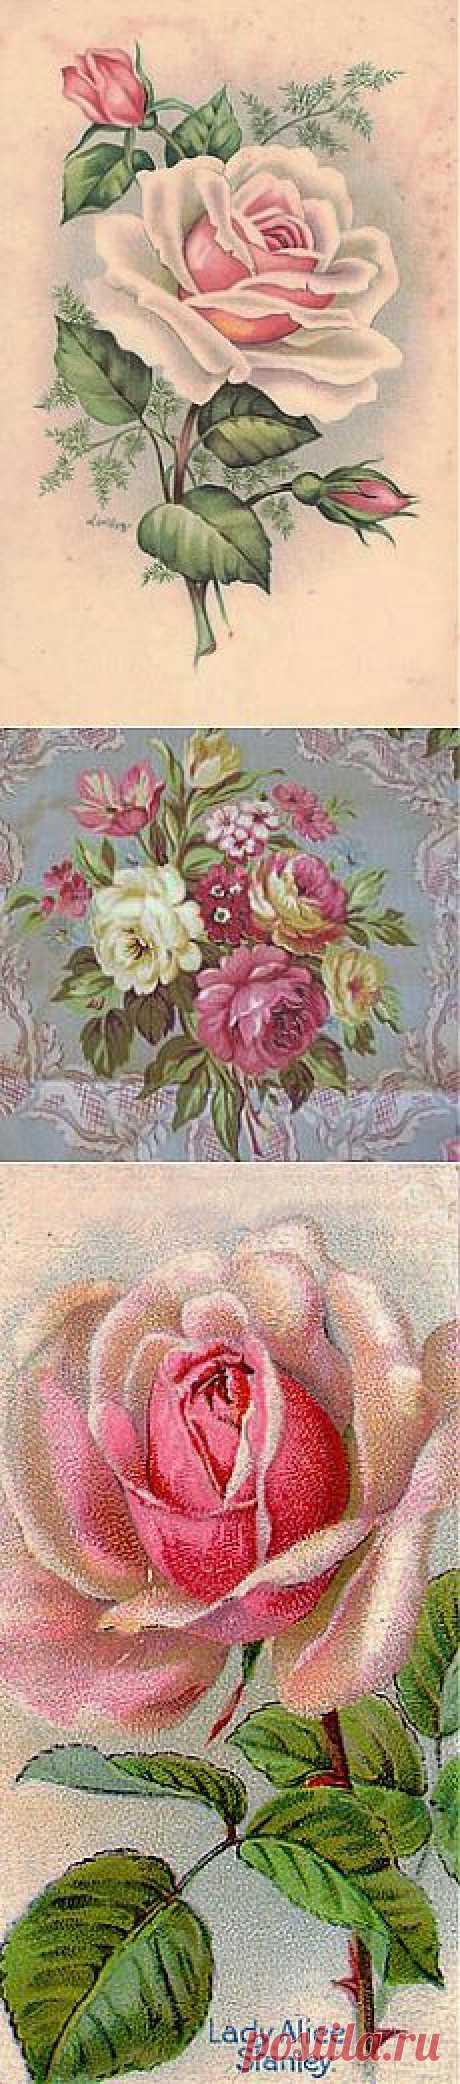 Vintage roses в Pinterest